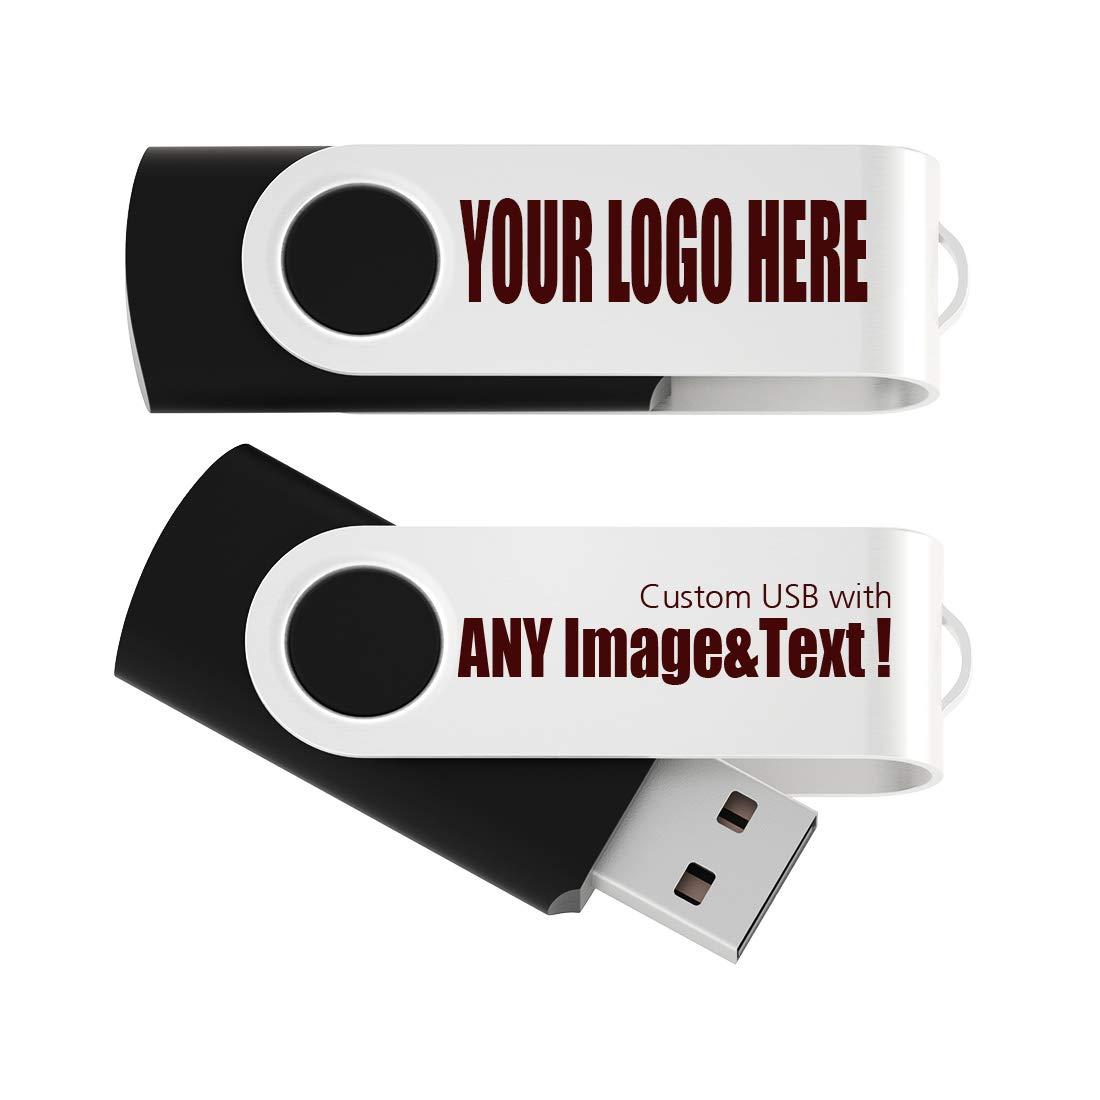 100 Pack 4GB USB Flash Drive Custom USB Thumb Drive Promotional Memory Stick Personalized Logo Jump Drive Twister Swivel Design in Bulk - PMS